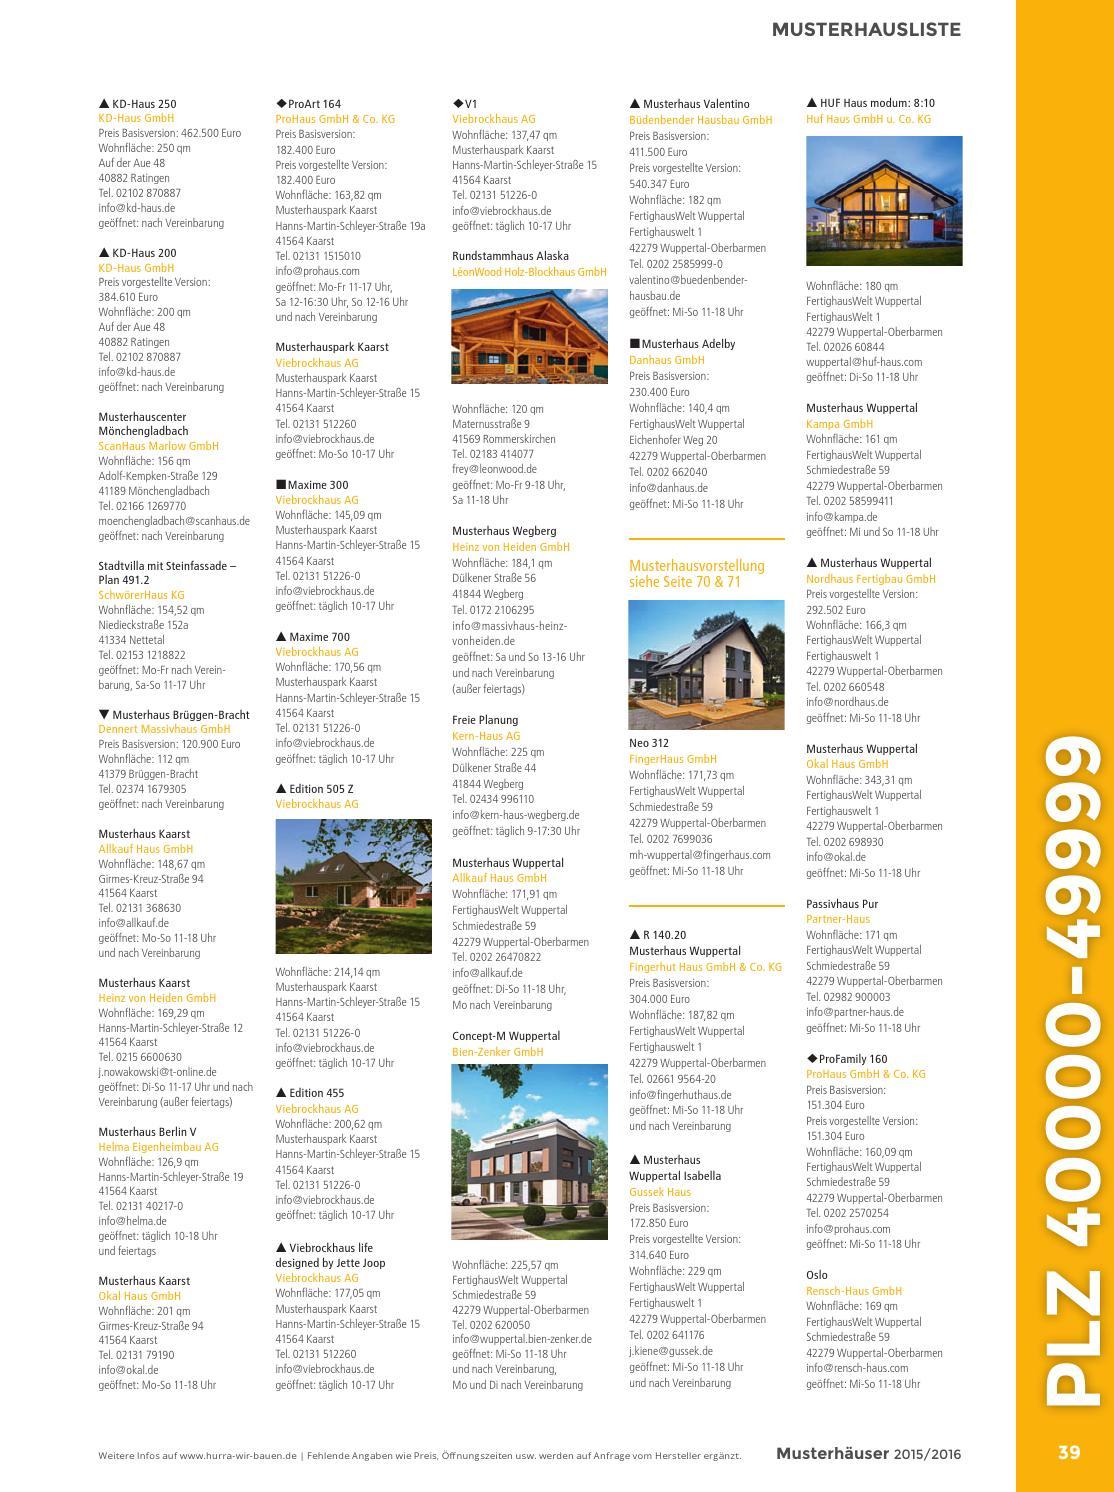 Viebrockhaus Preisliste 2013 Epub